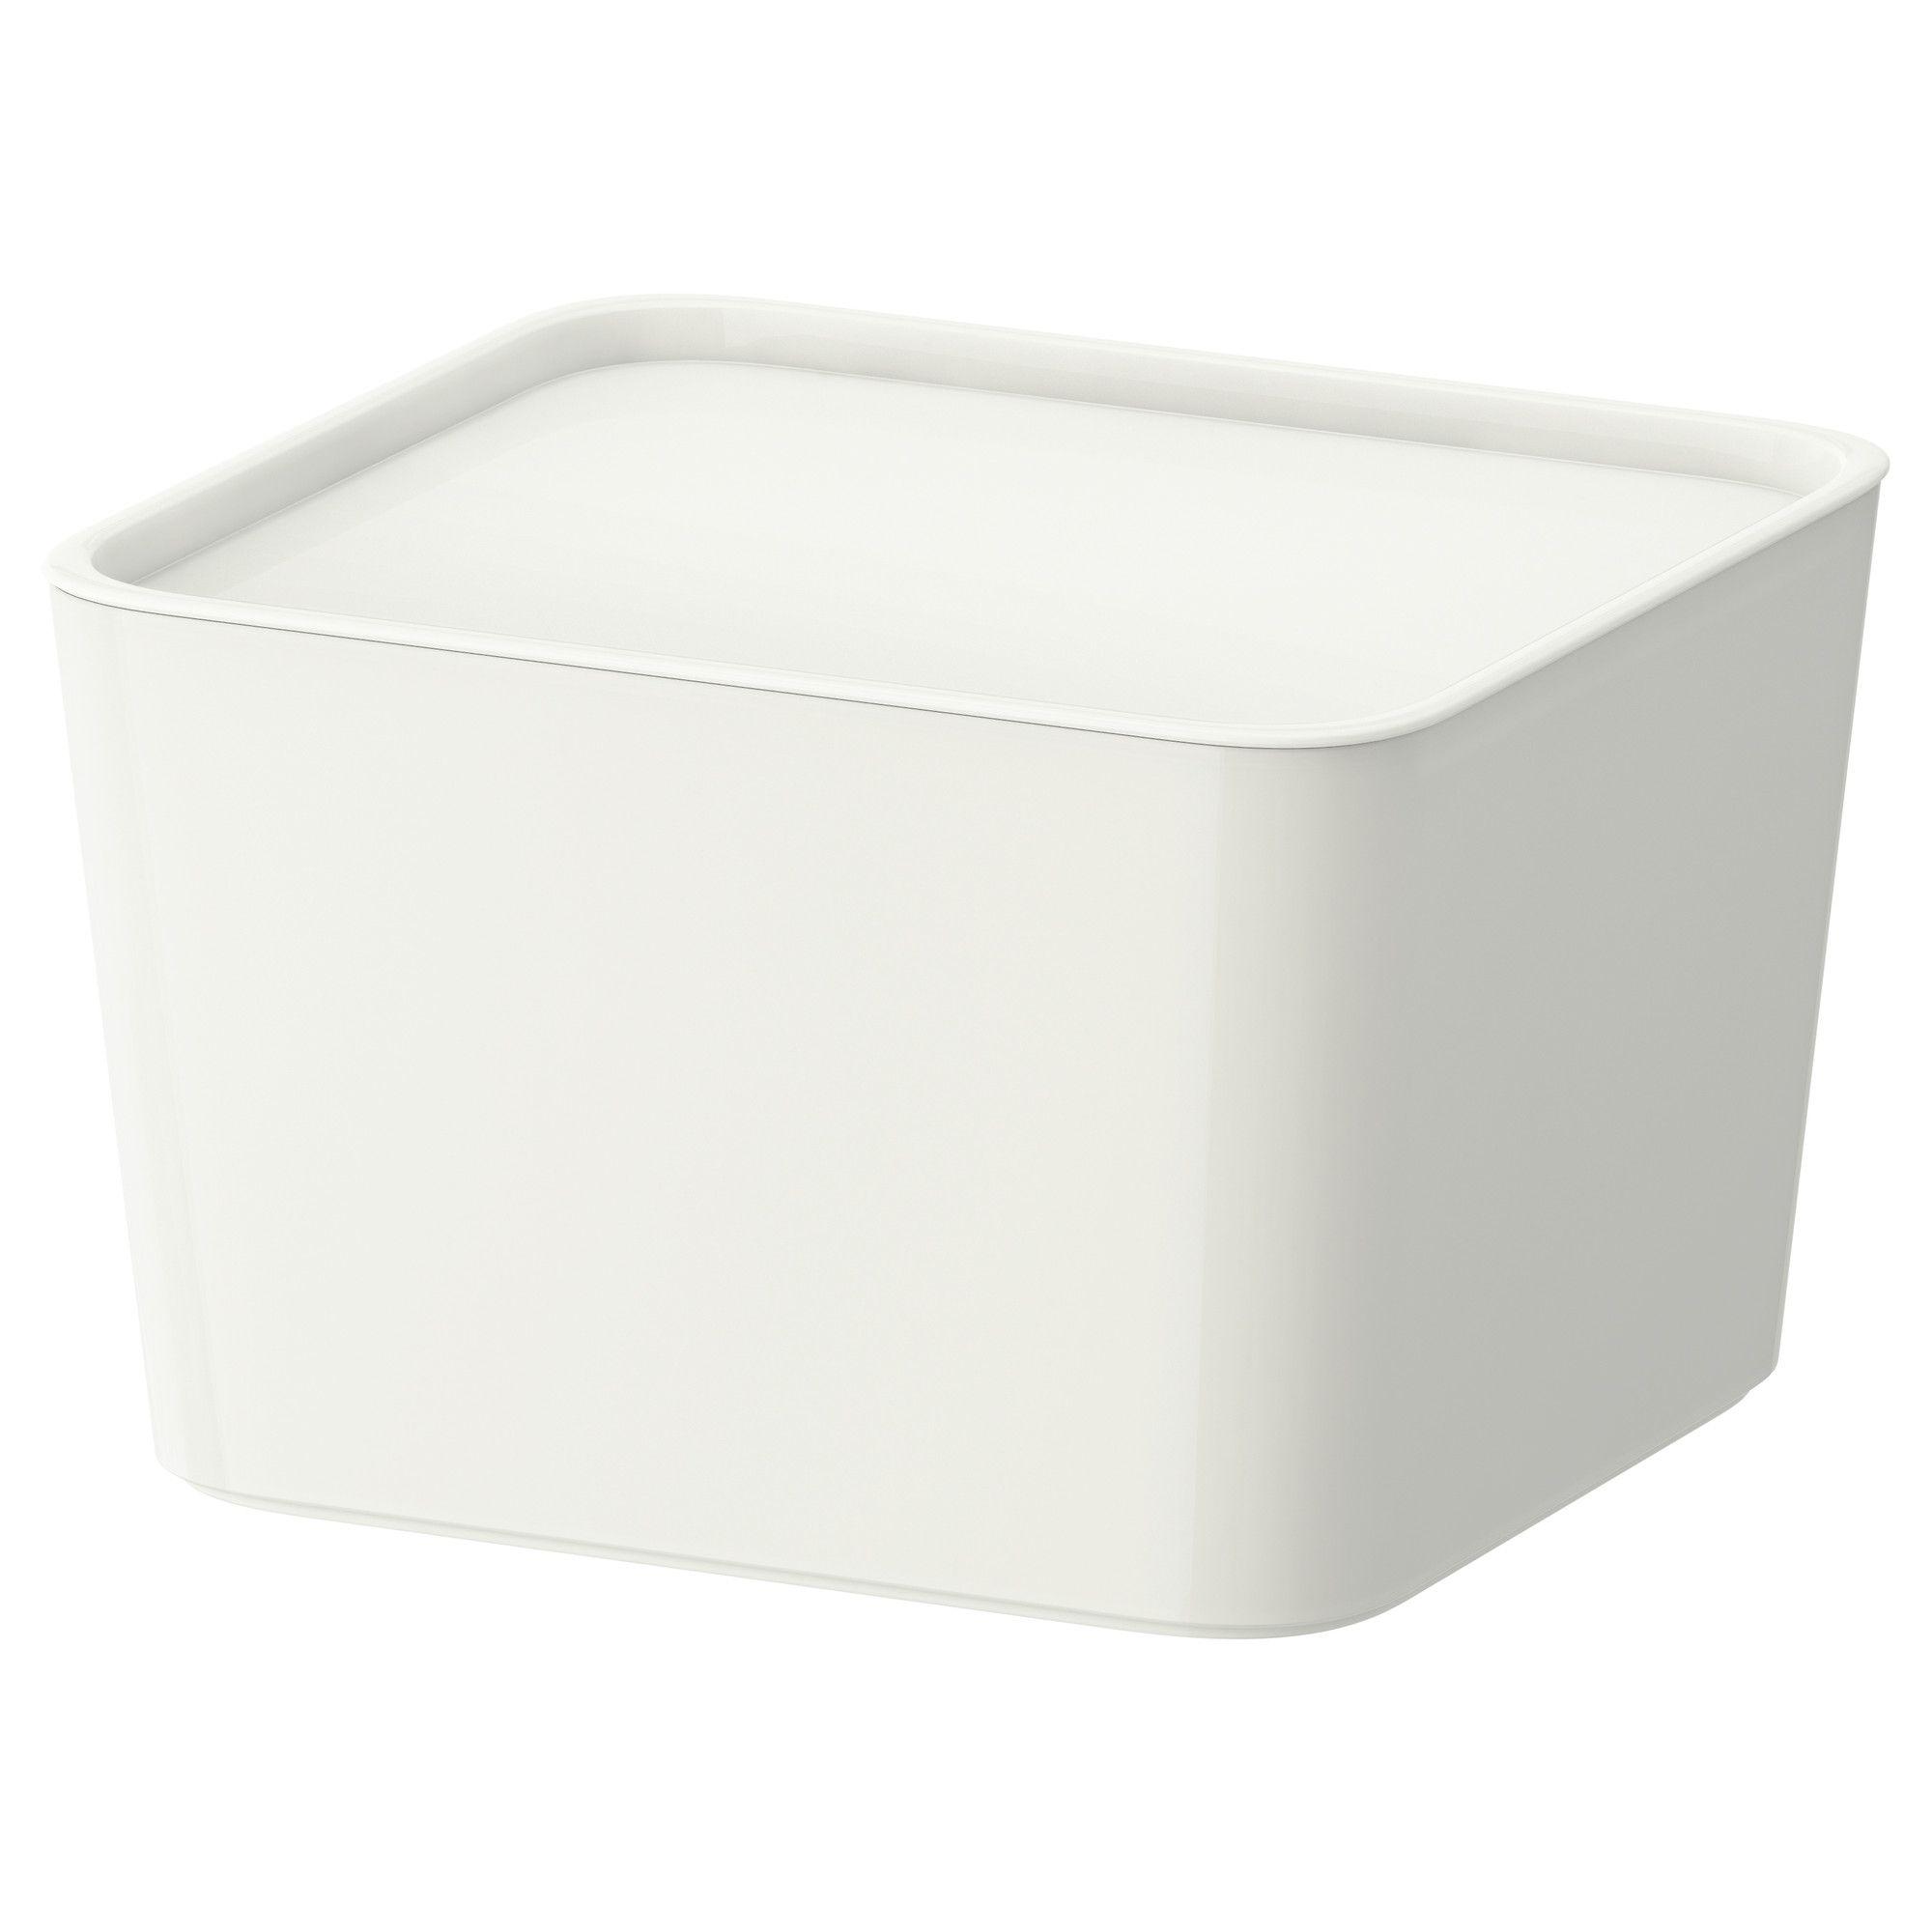 PLUGGIS Kannellinen laatikko - 27x24x16 cm - IKEA